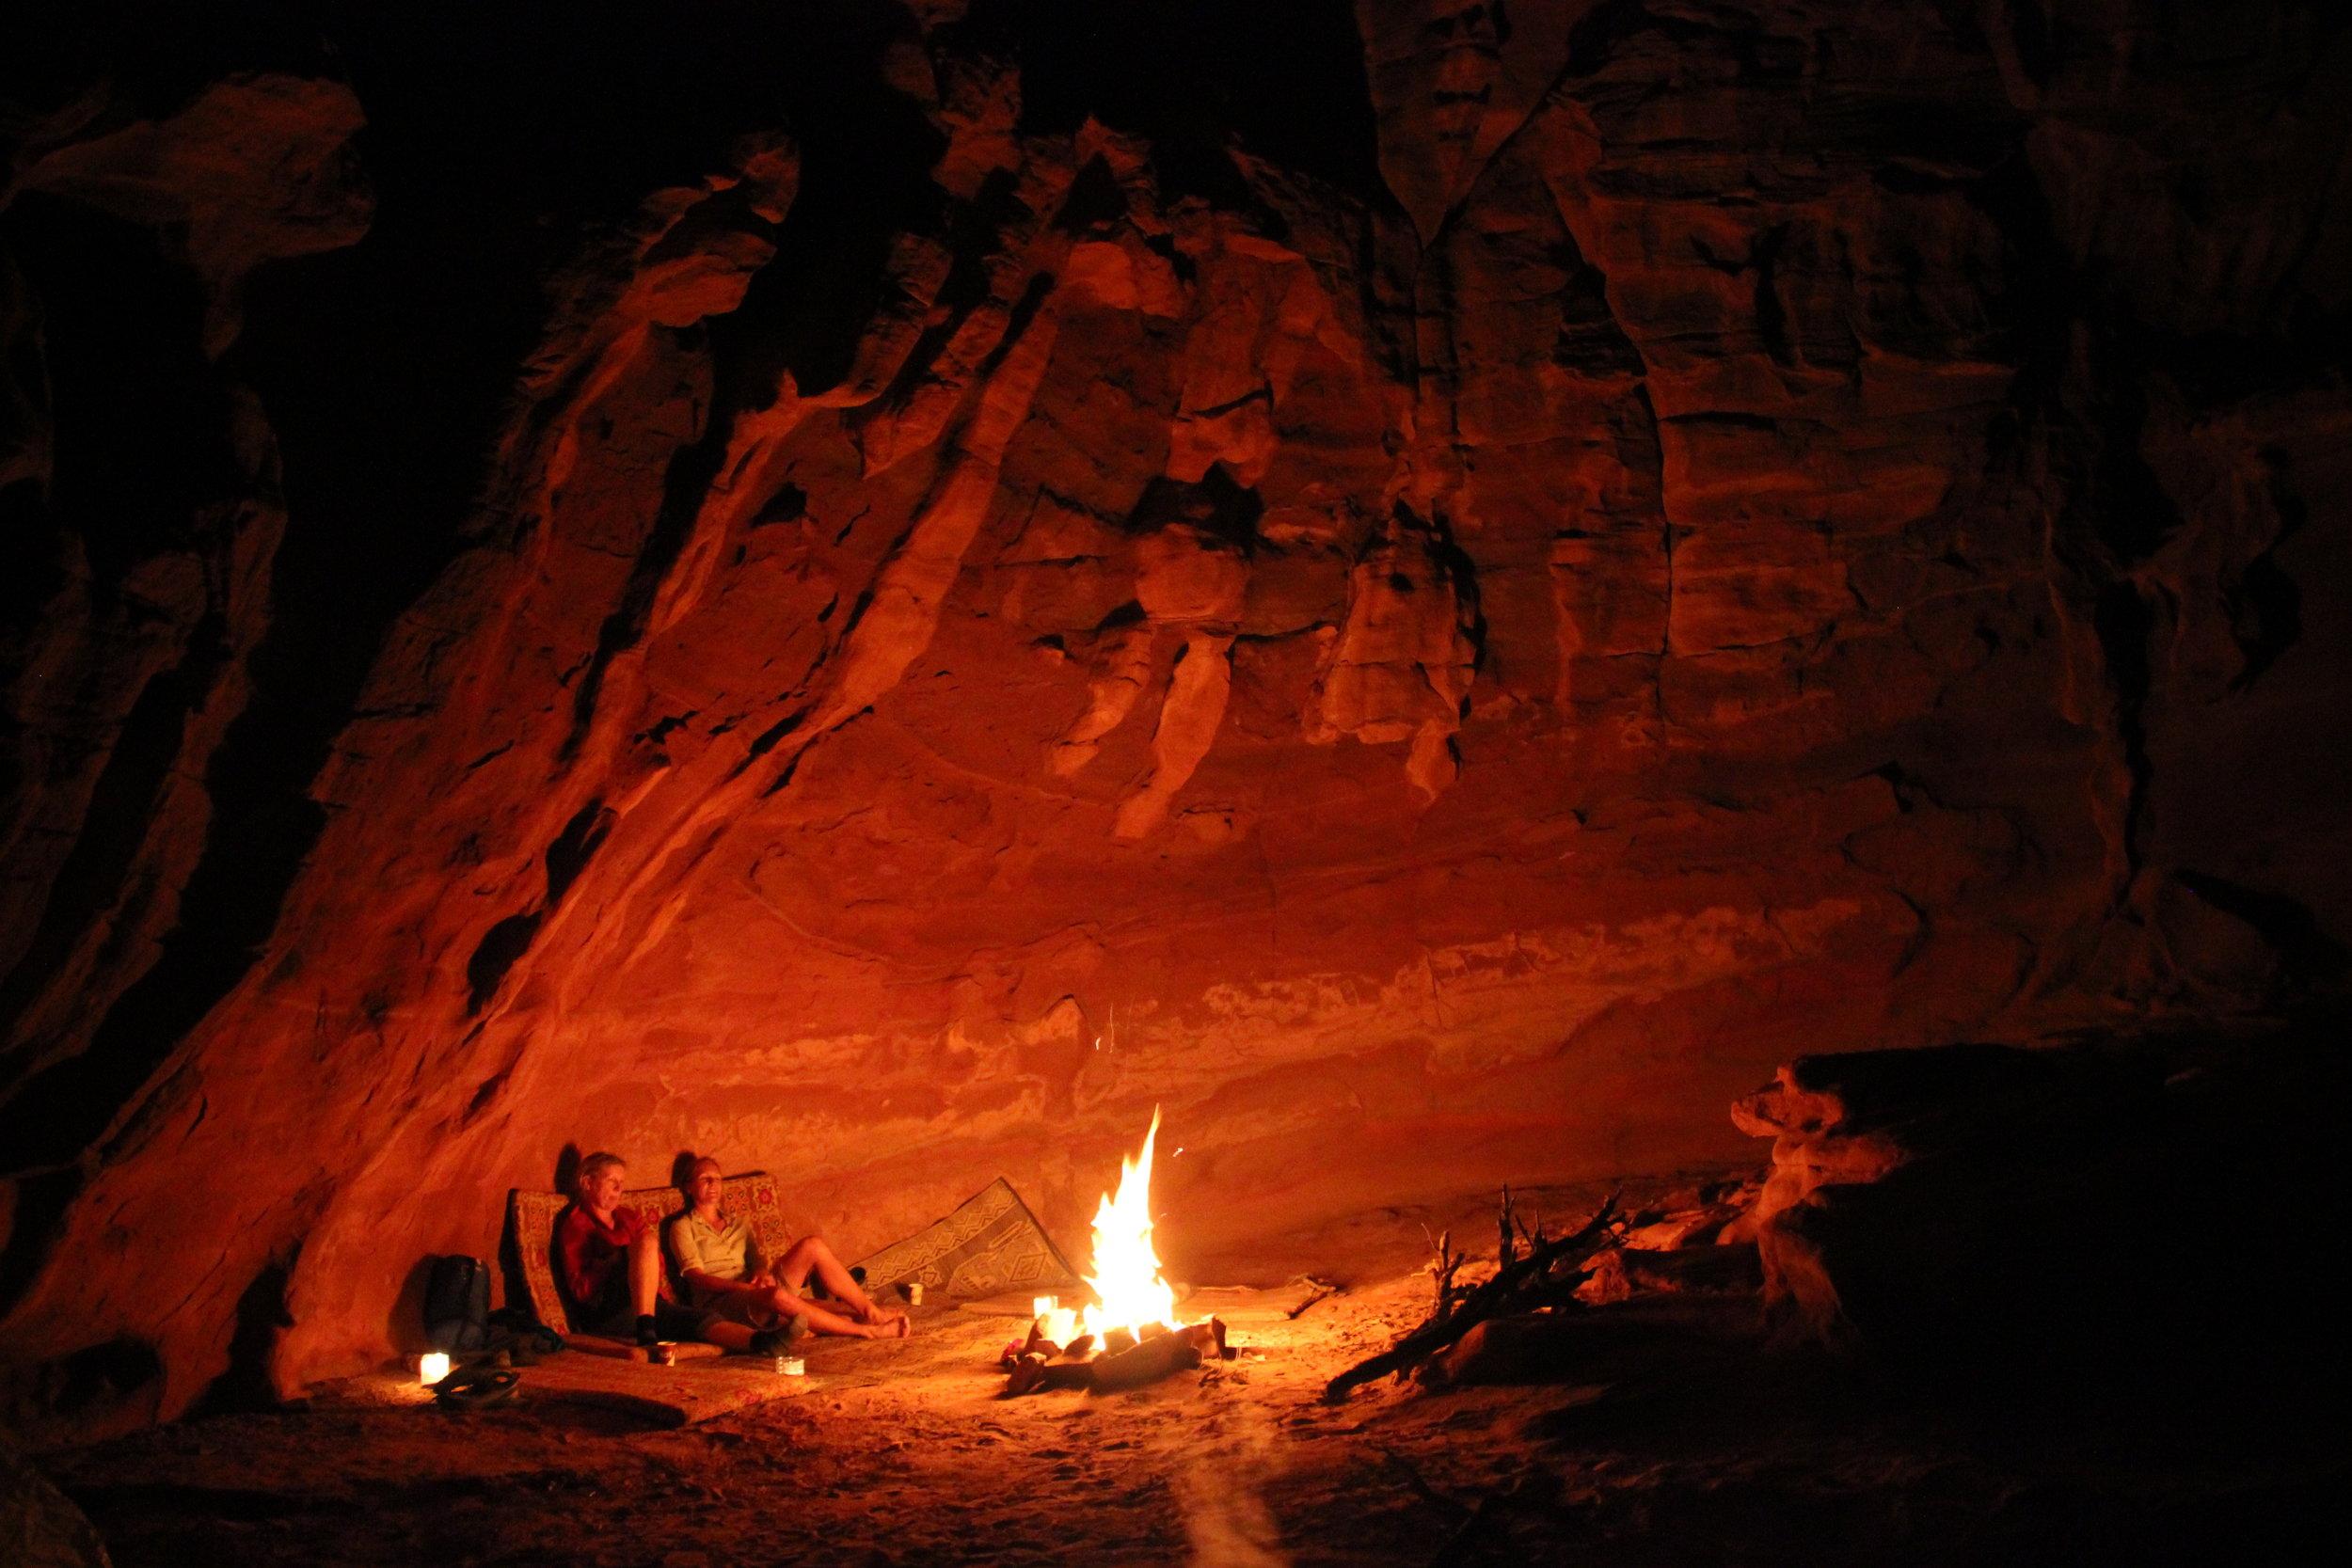 bivouac-under-the-stars-wadirum.JPG